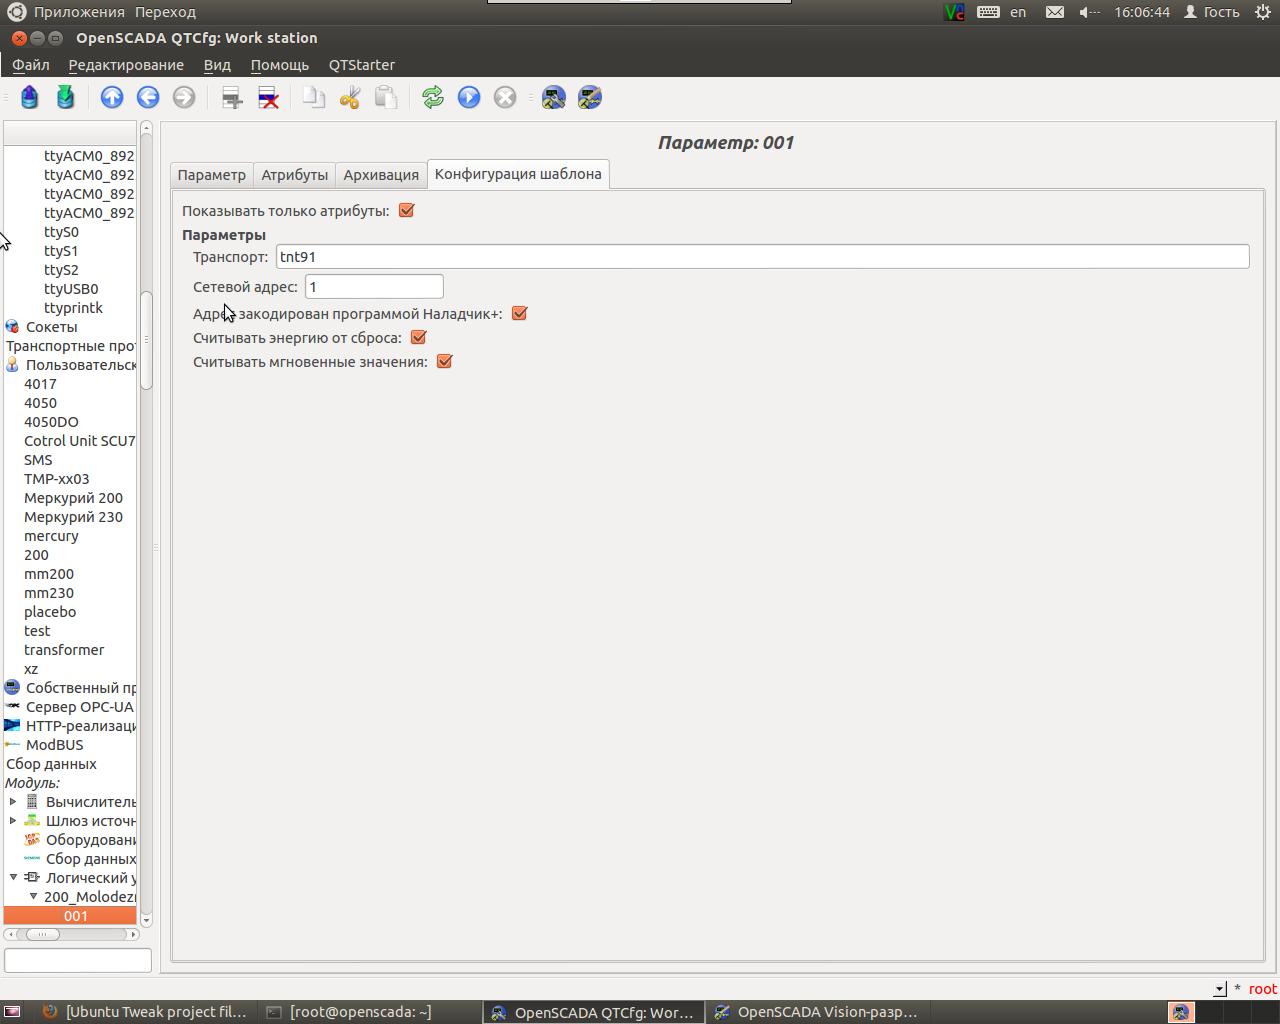 Пишем протоколы счетчиков Меркурий 230 и Меркурий 200 для OpenSCADA - 26